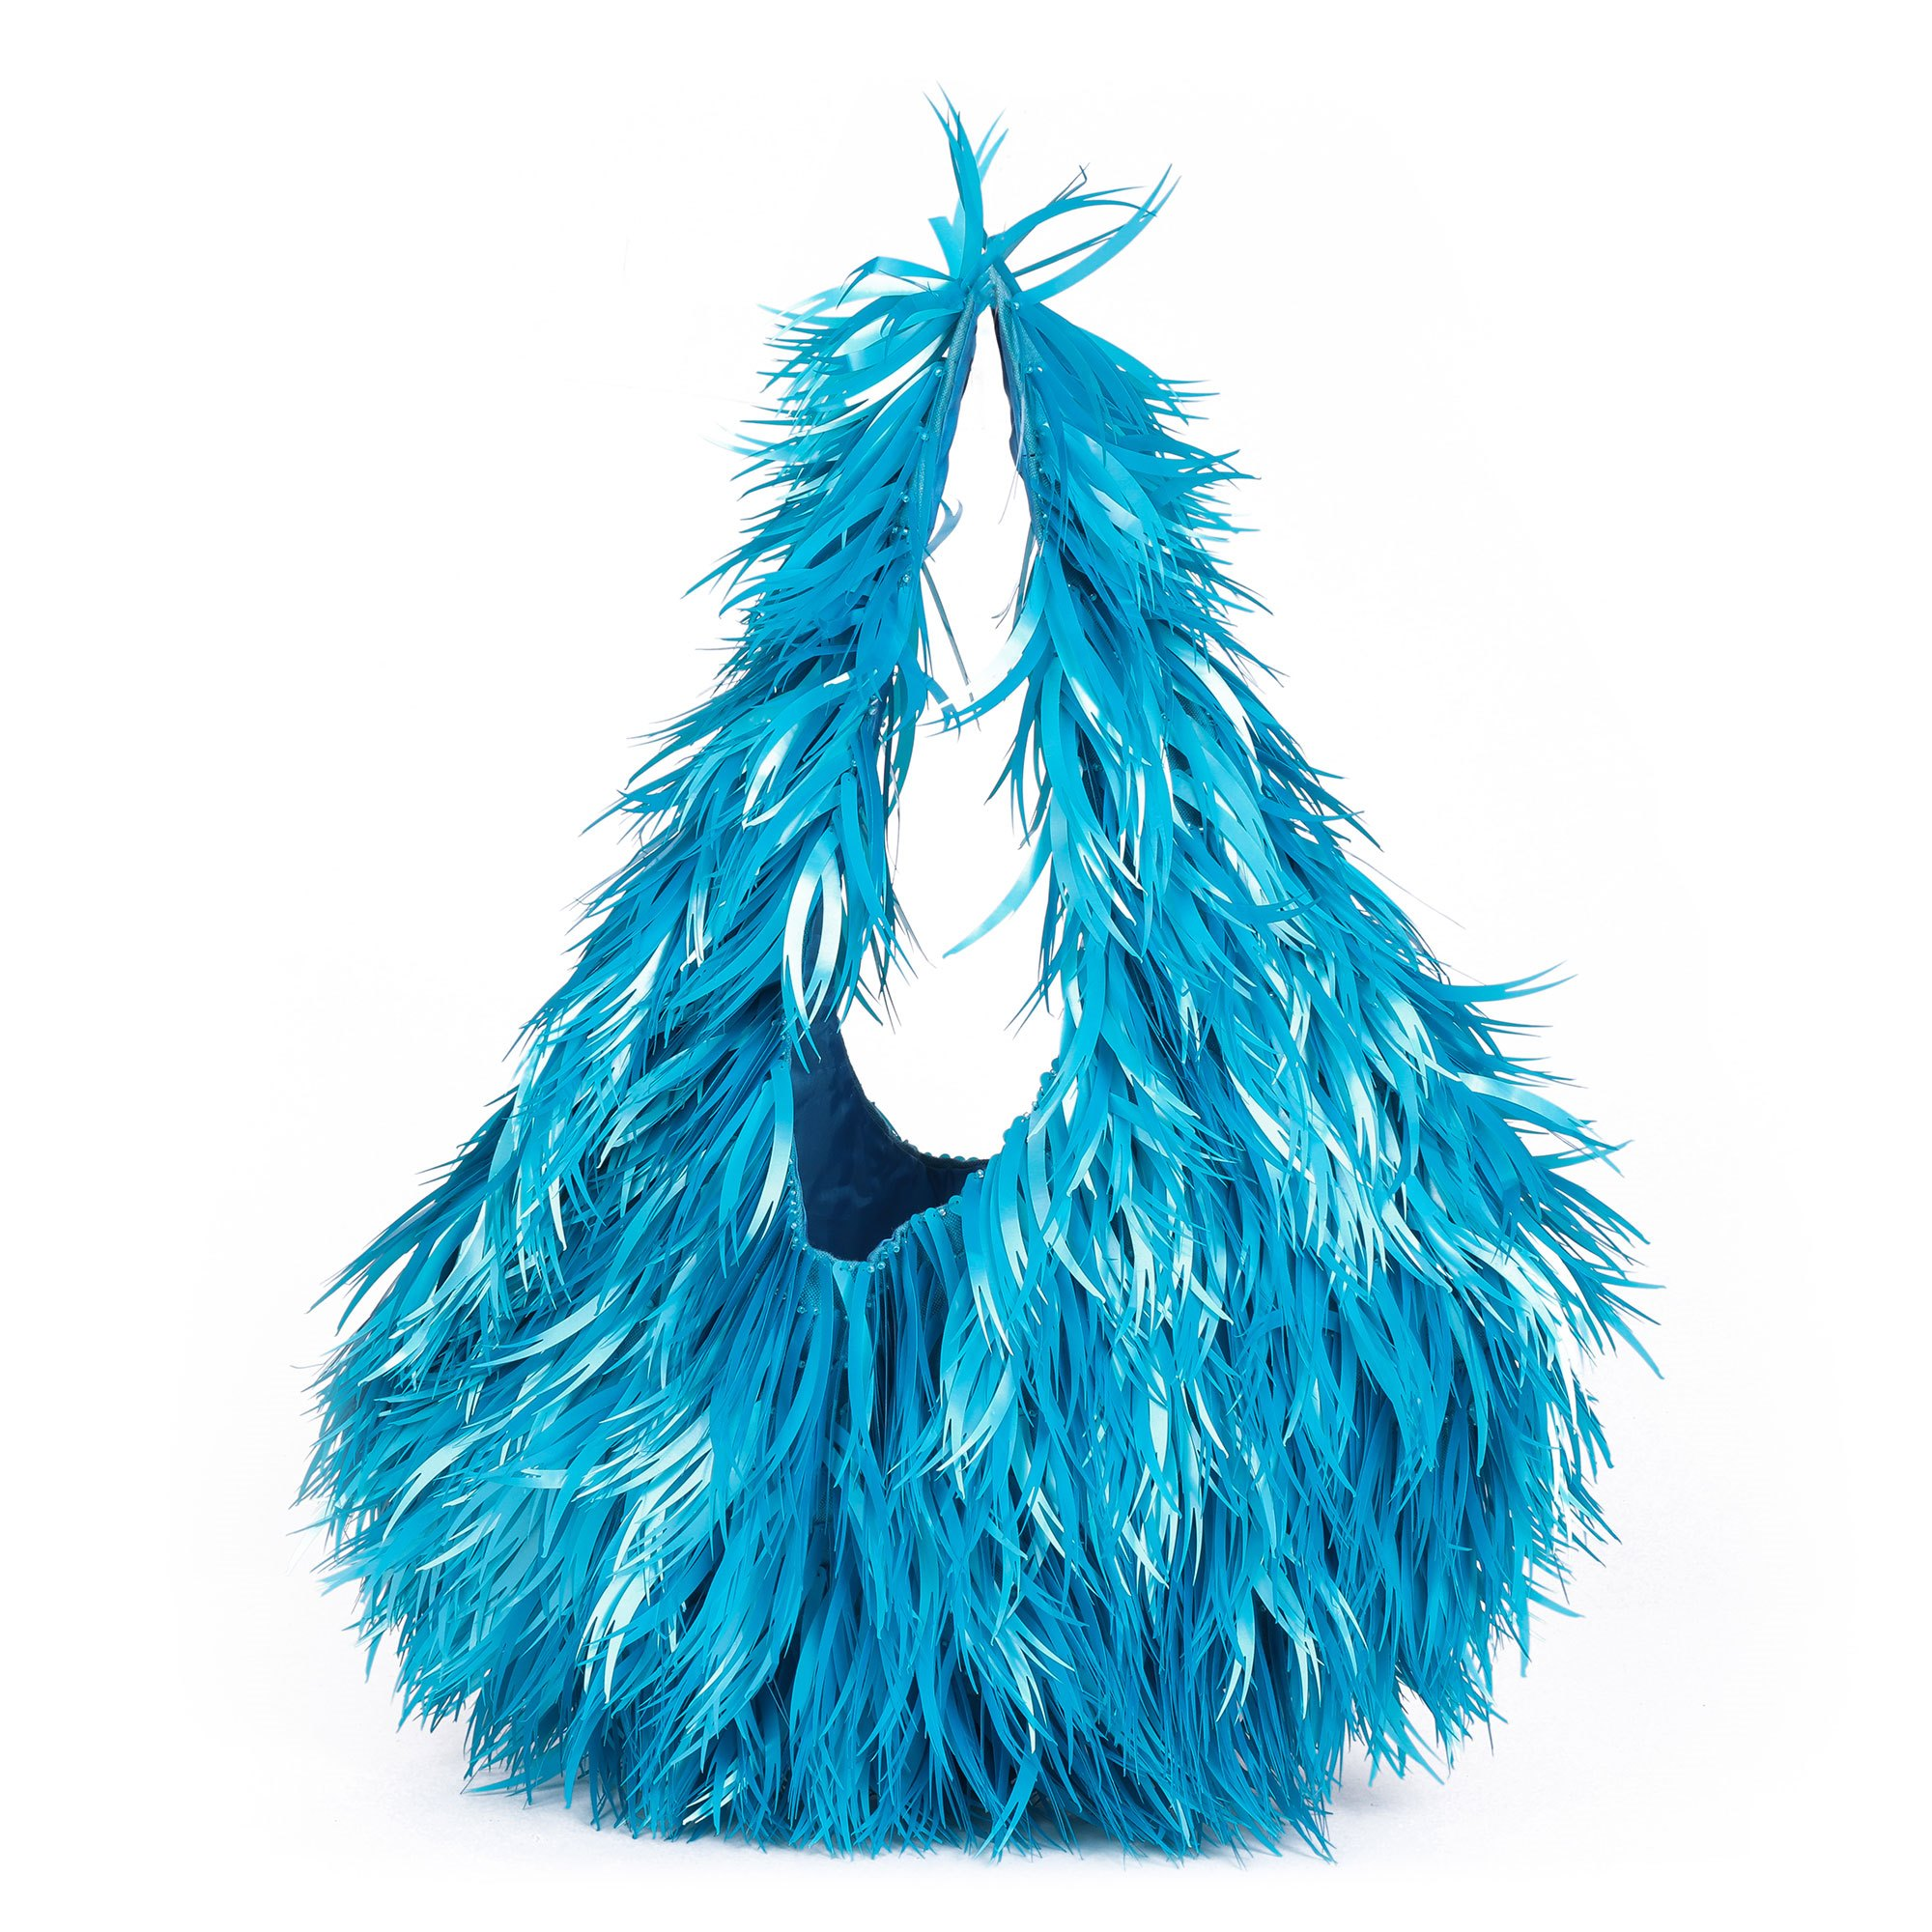 Chloé Celeste Plastic Beaded & Embellished Canvas Hobo Bag